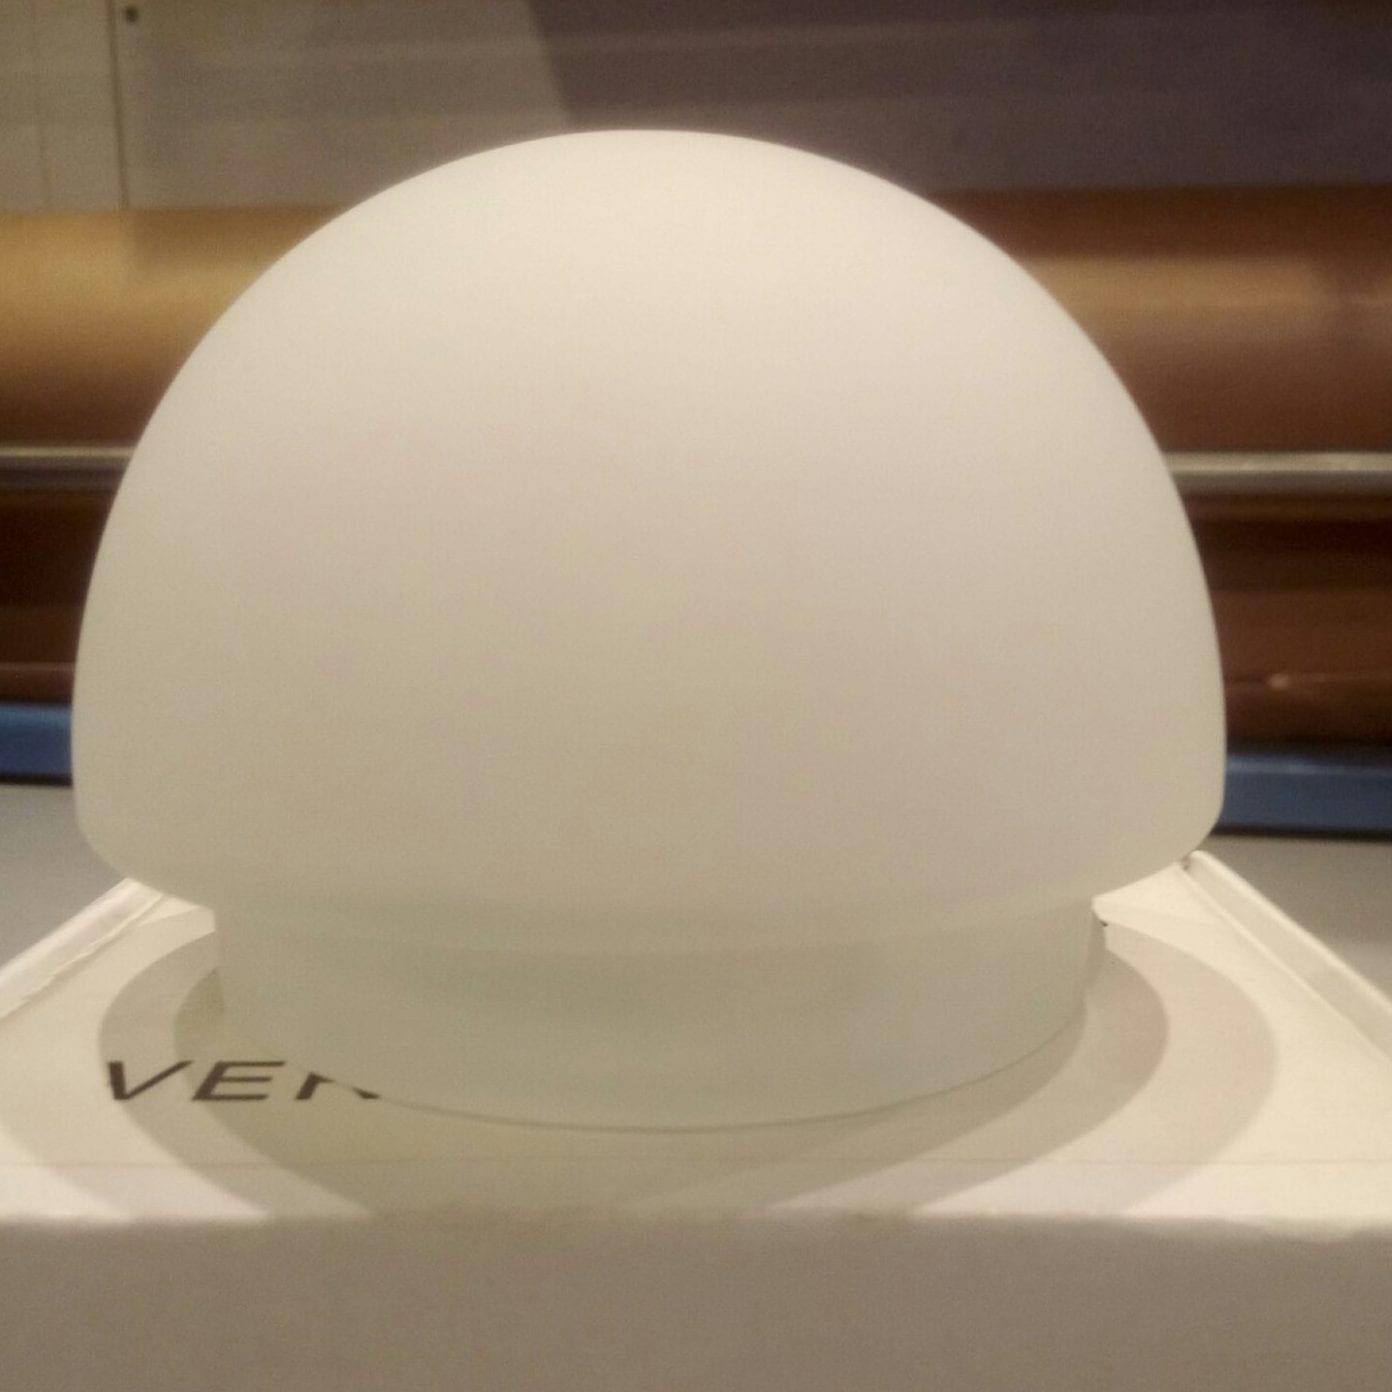 Glasskuppel for Verona vegglampe | Illuminor as